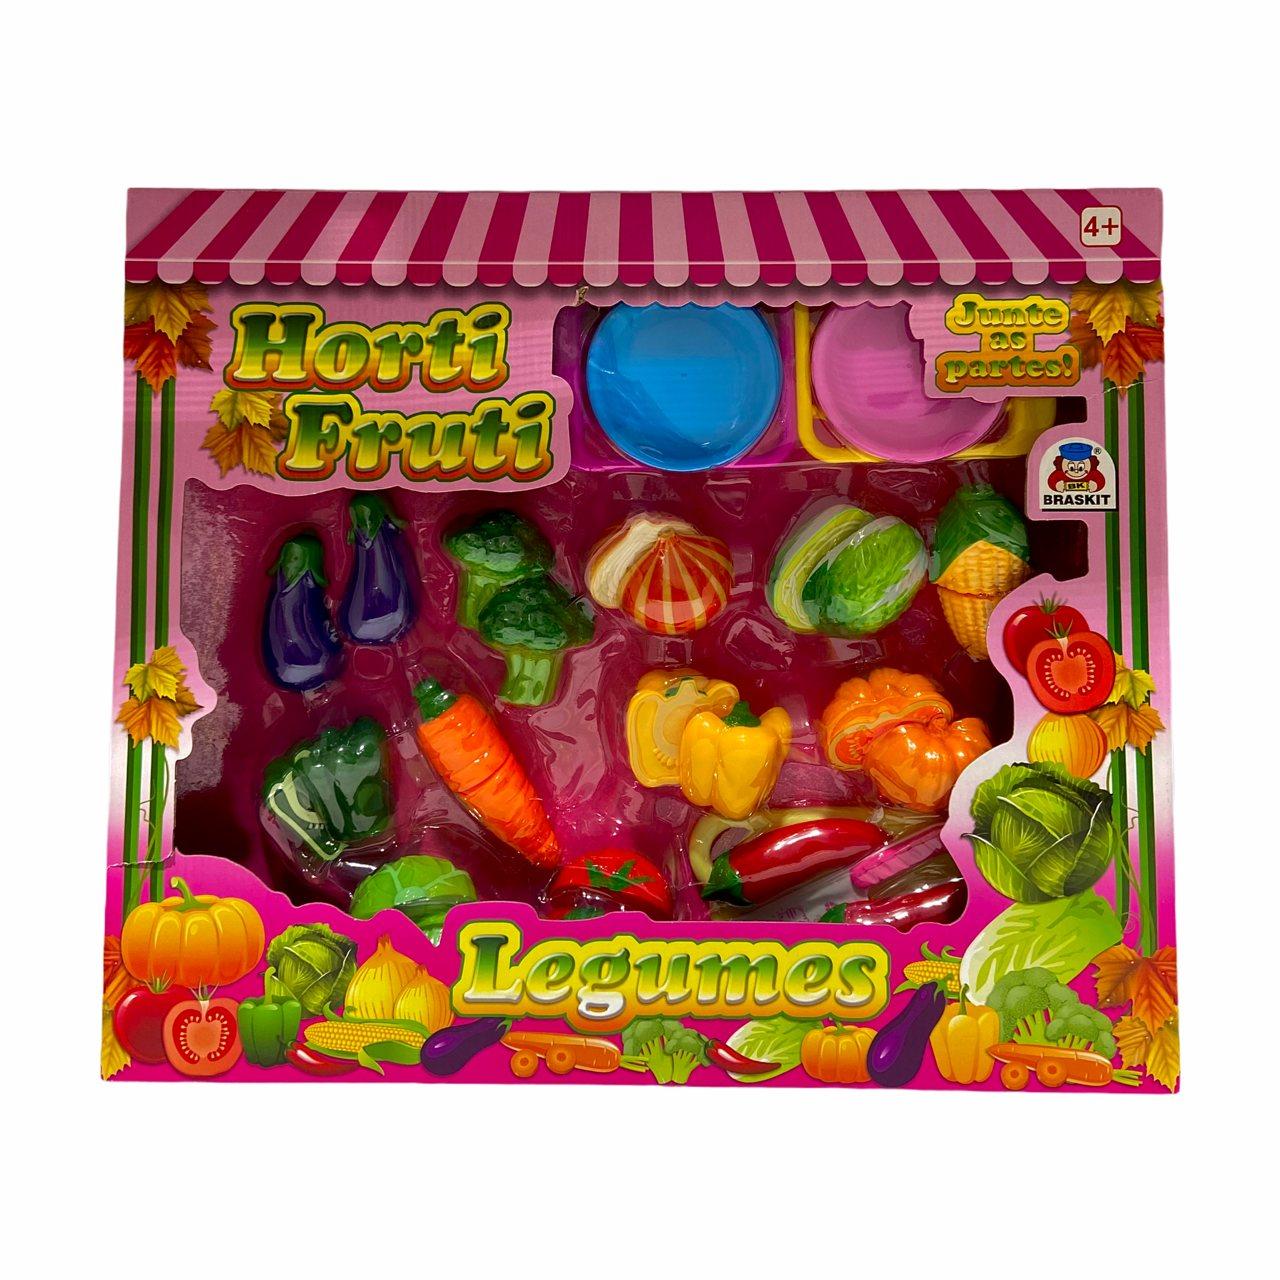 Horti Fruti Frutas ou Legumes Junte as Partes - Braskit